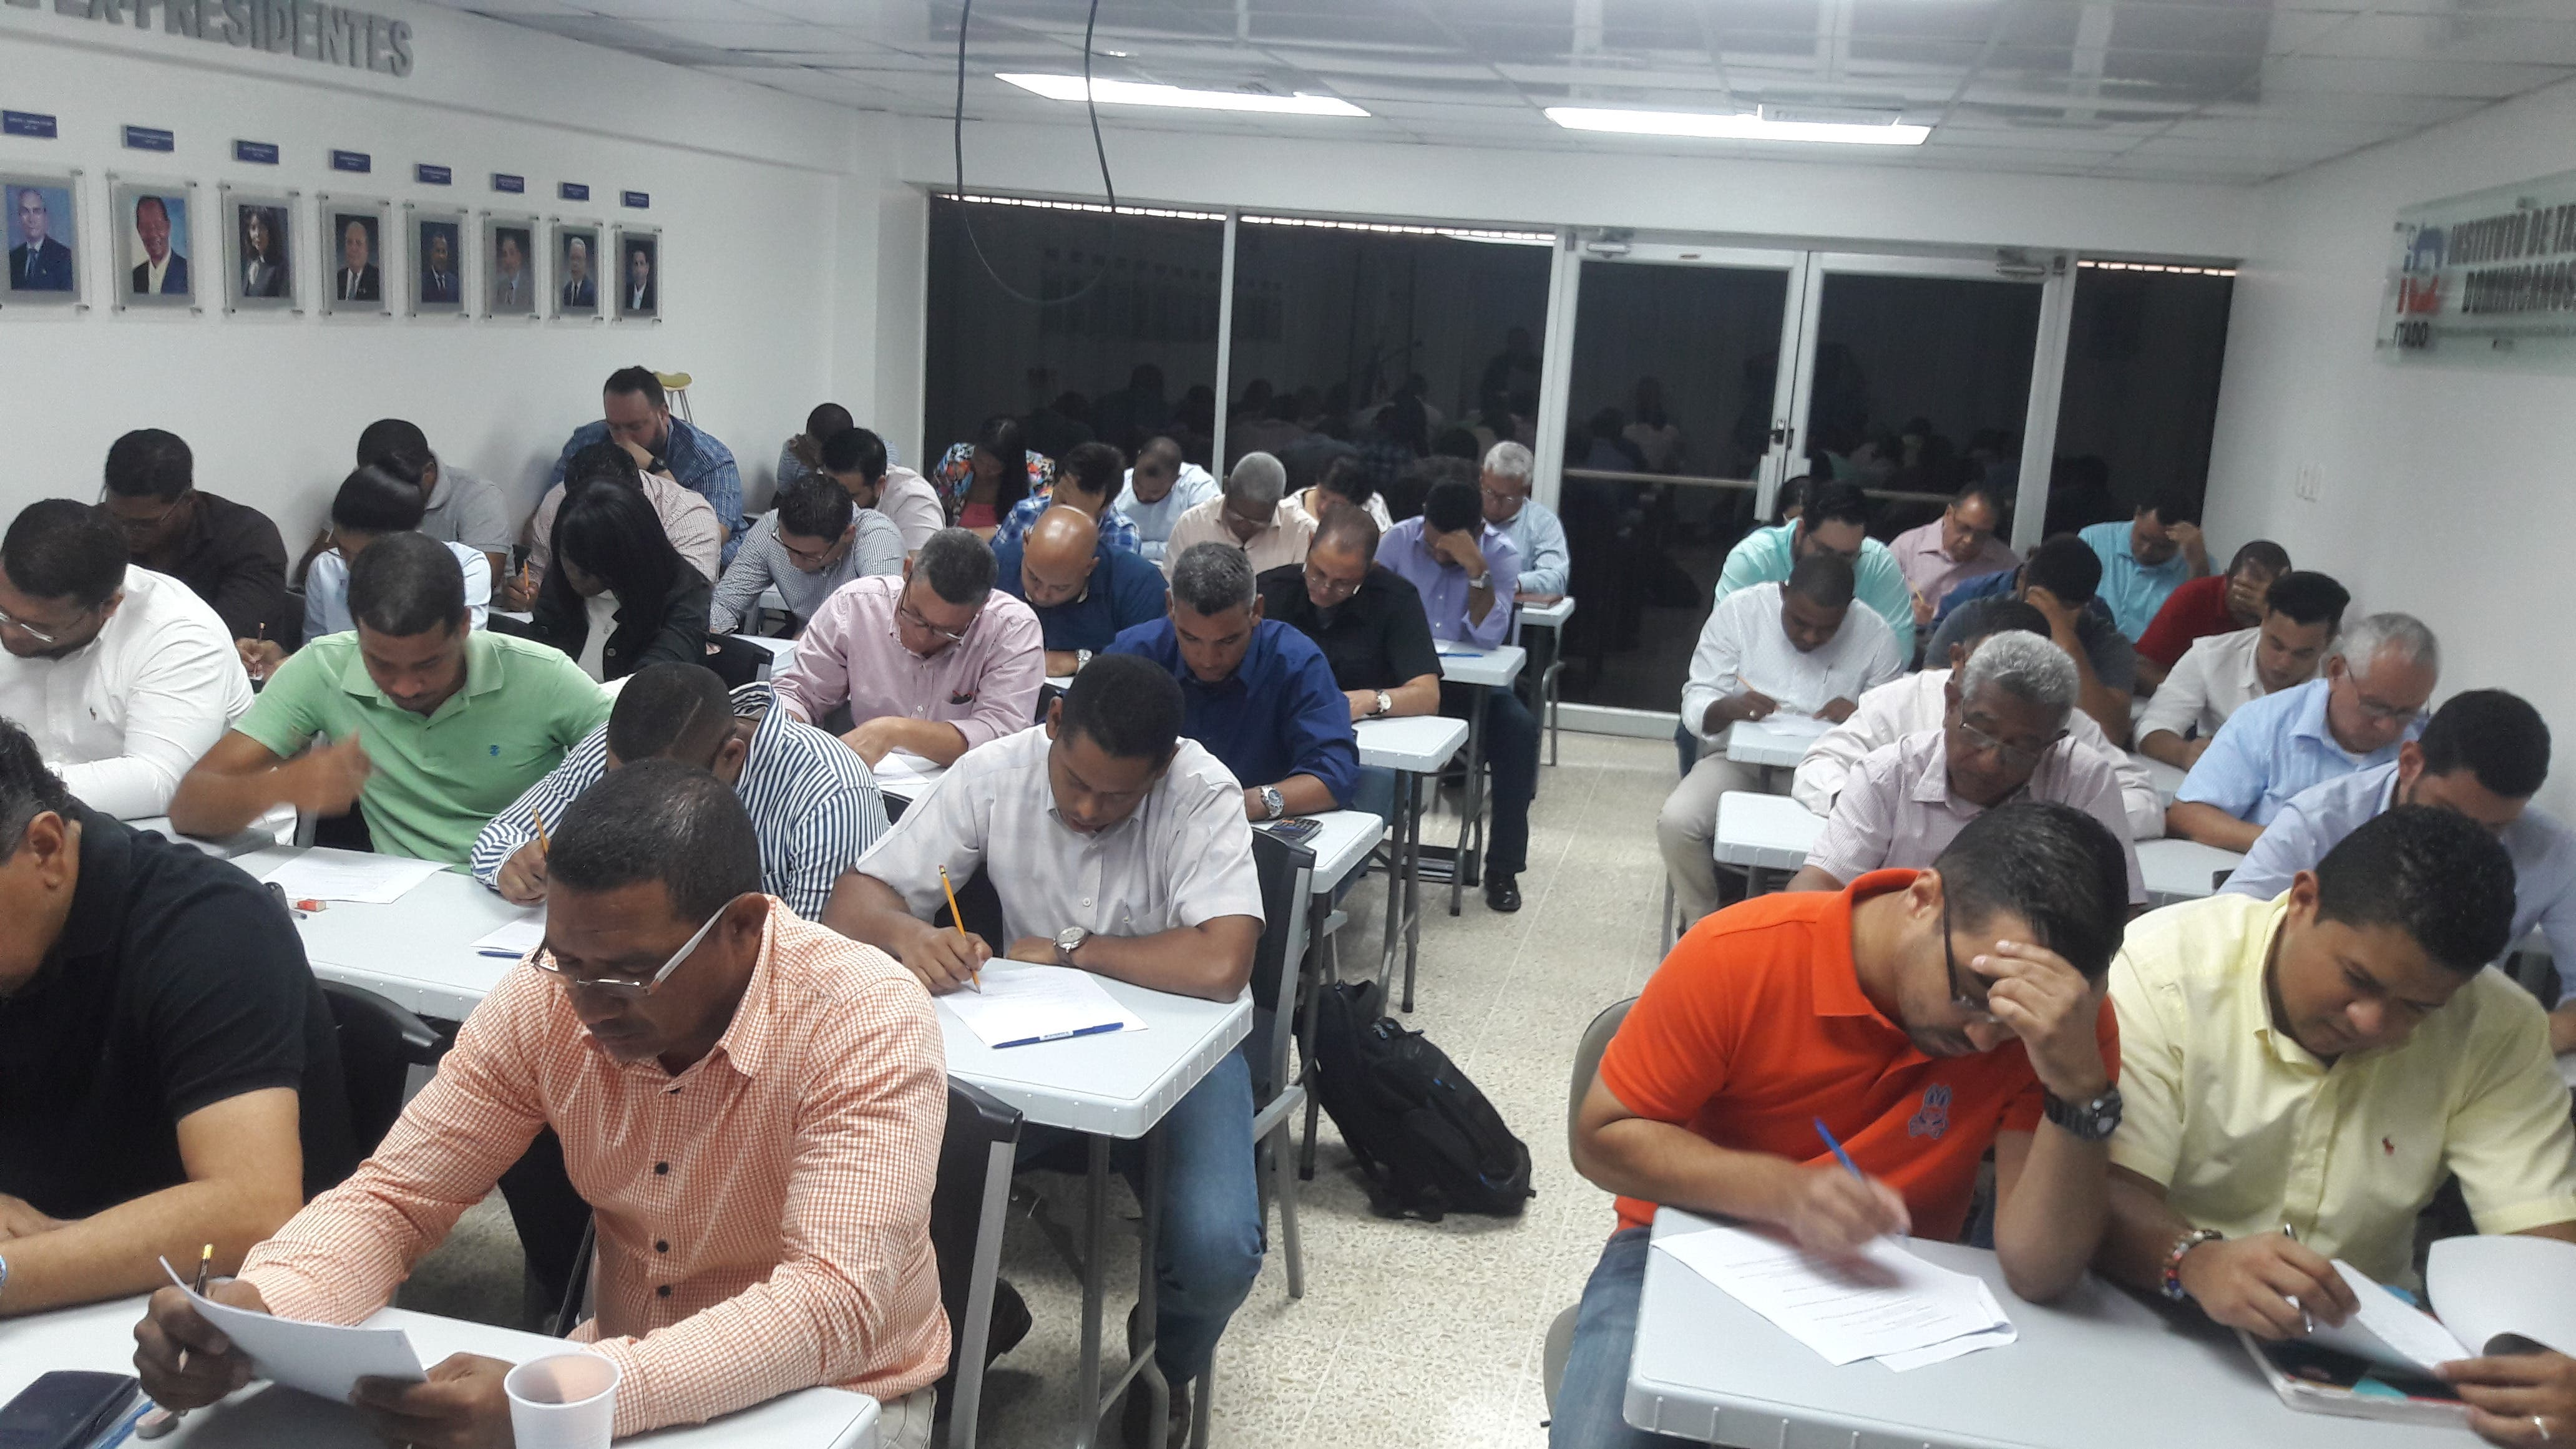 ITADO imparte examen de admisión a aspirantes a nuevos miembros